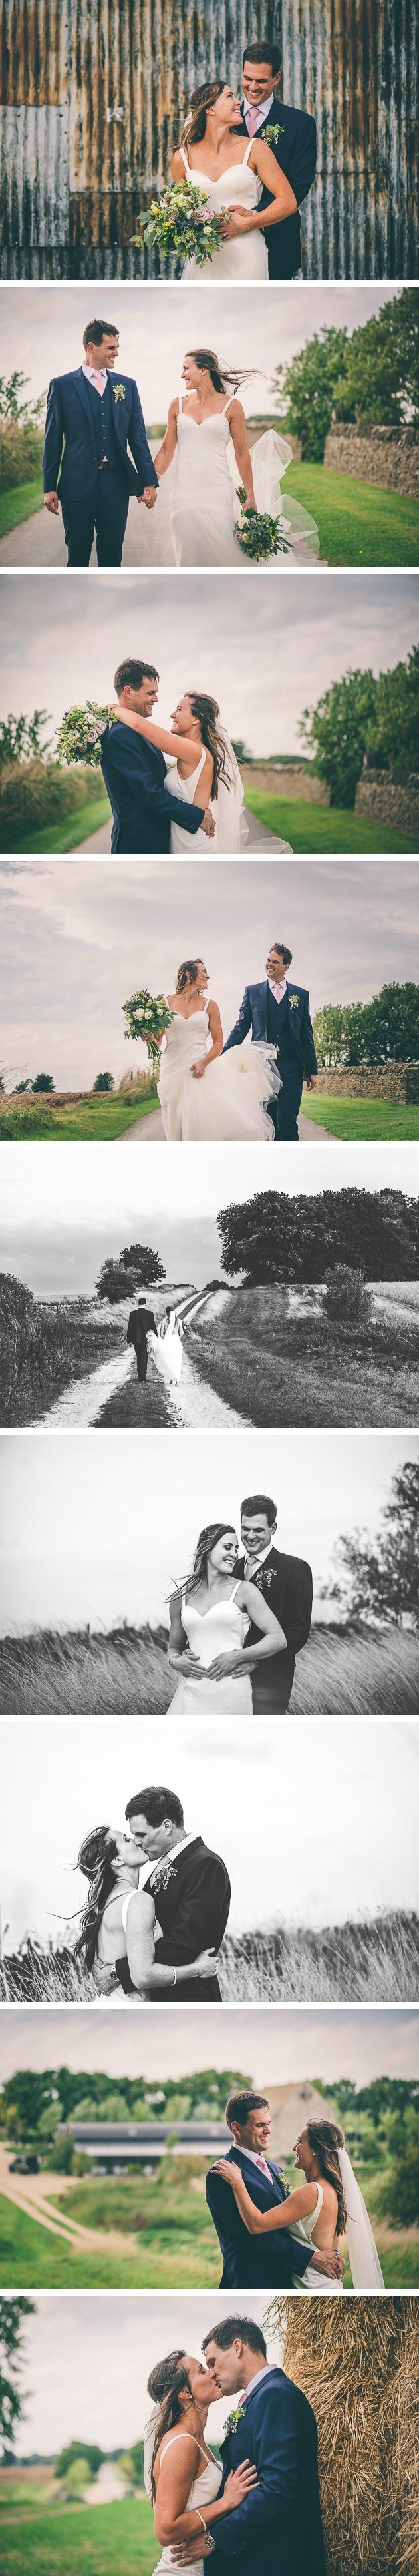 Stone Barn Summer Wedding